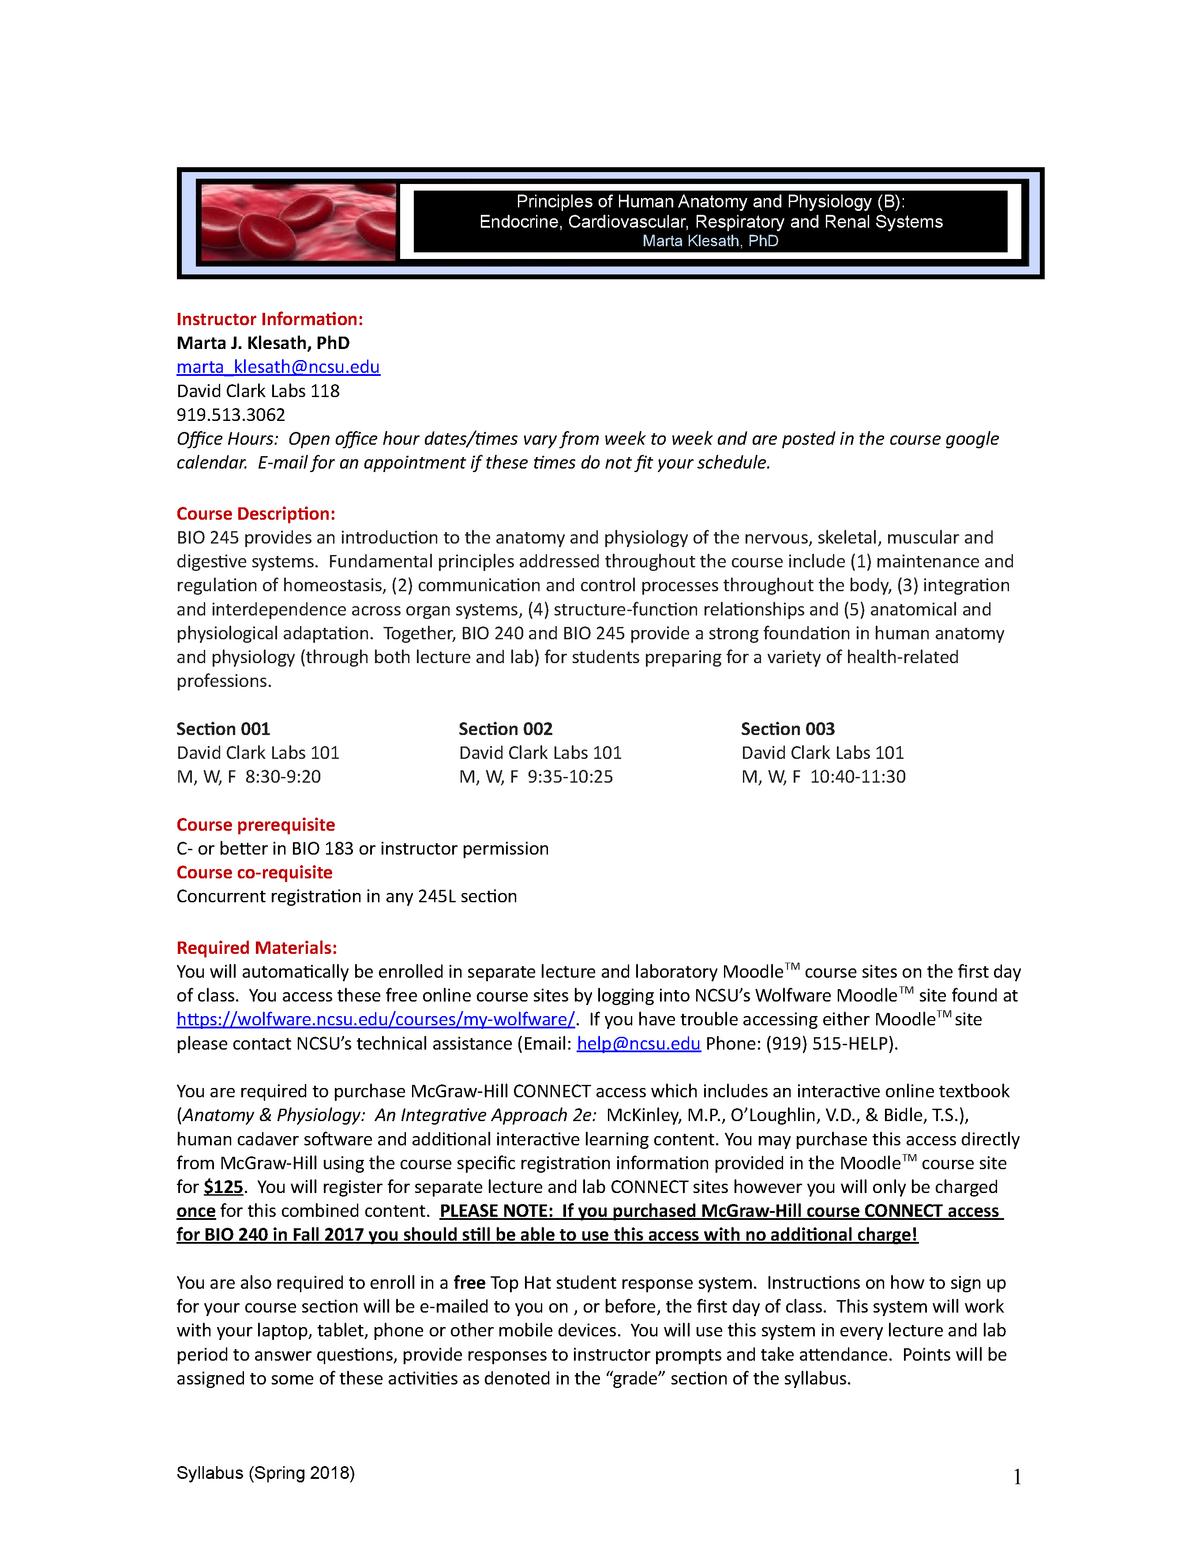 Ncsu Academic Calendar.Bio 245 Human Ap Spring 2018 Bio 245 Principles Of Human